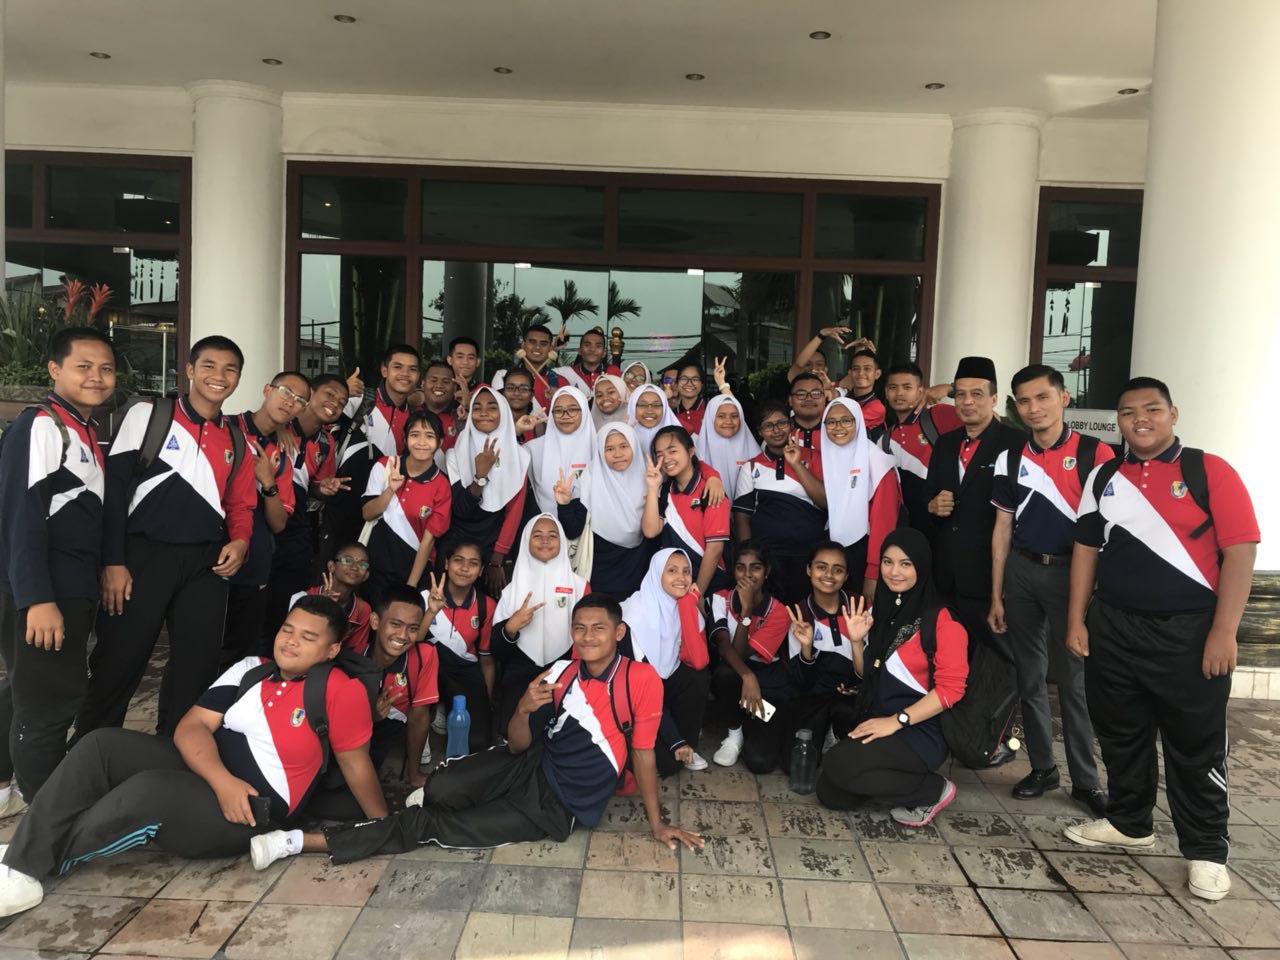 Peragaan KrMJ SMK Skudai Sempena Bengkel Amalan Kepimpinan PAK21 Model 3.0